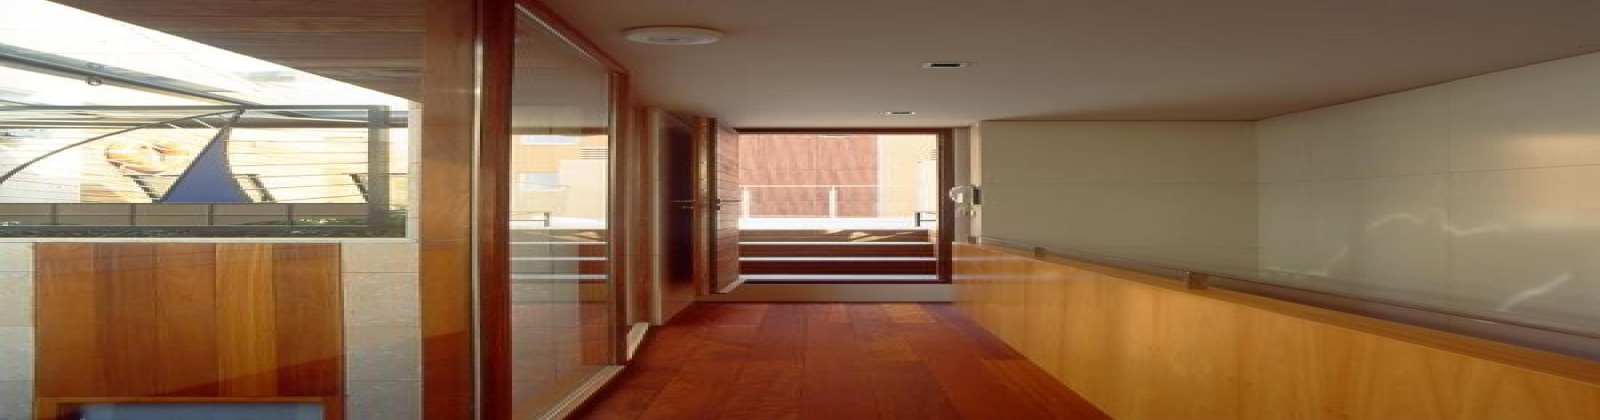 5 Bedrooms, Villa, Vacation Rental, Barcelona, Carrer de Santa Marta, 3 Bathrooms, Listing ID 1006, Barcelona, Spain,